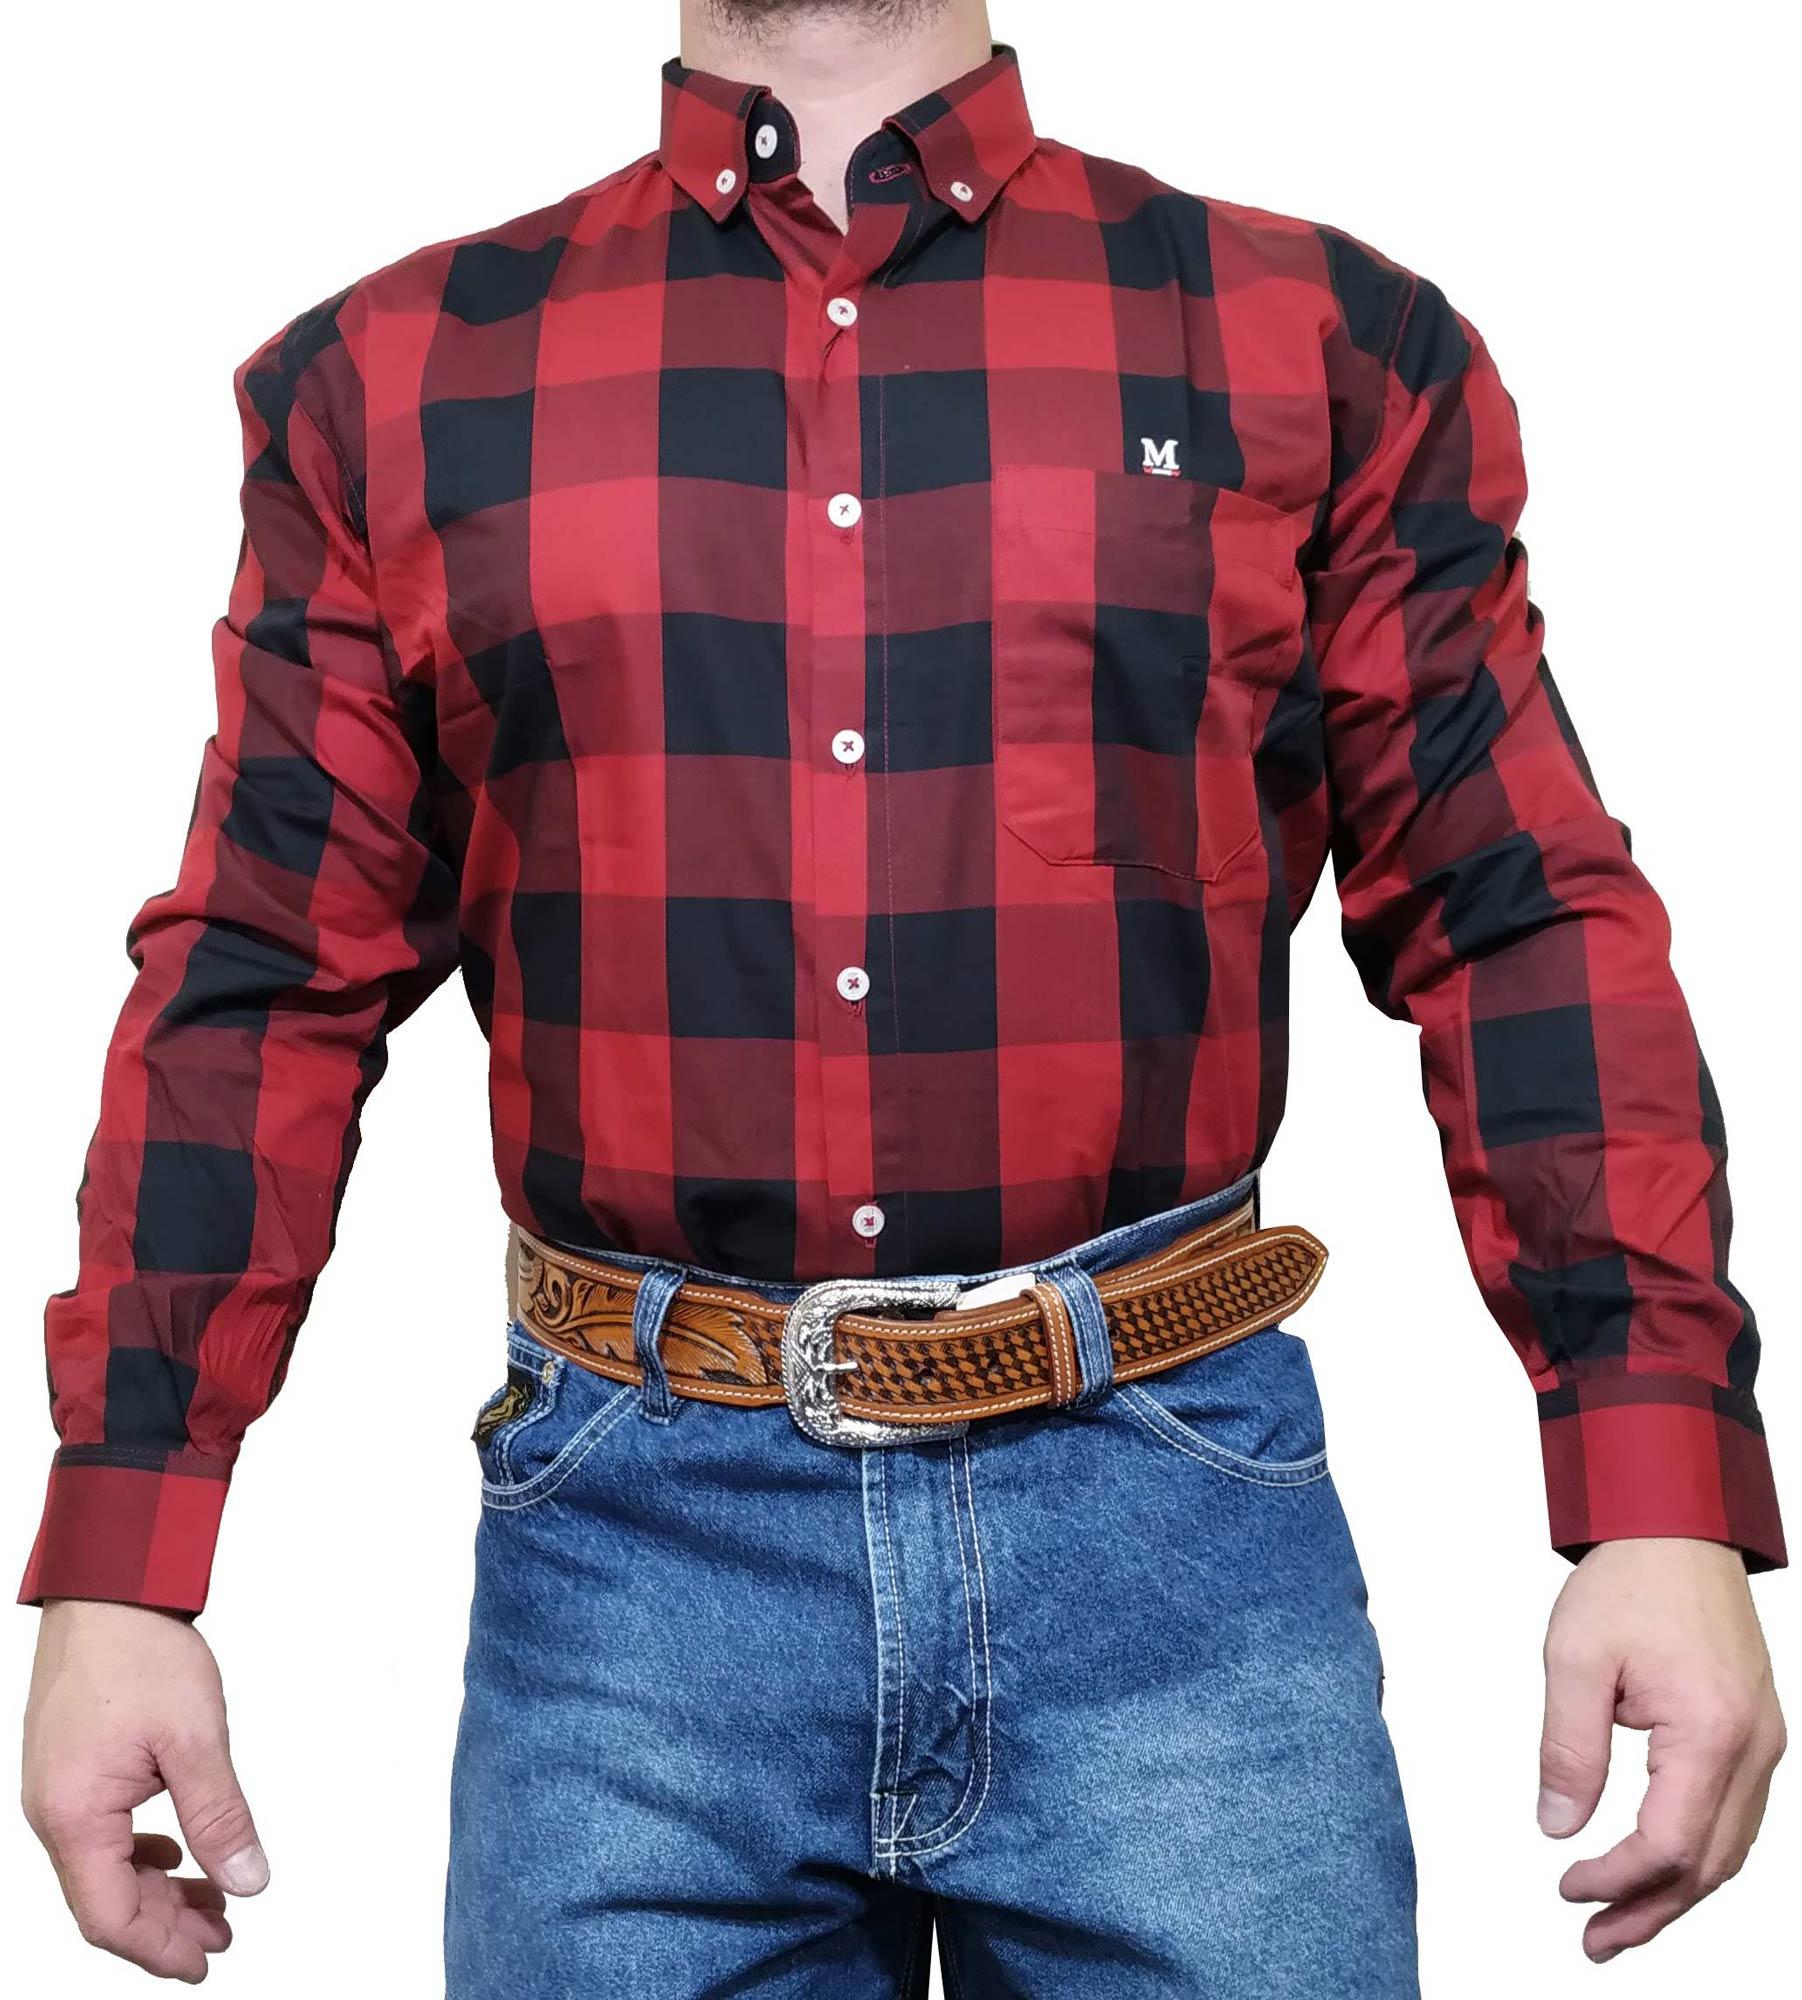 Camisa Masculina Minuty Ref. Xadrez Preto e Vermelho 2500